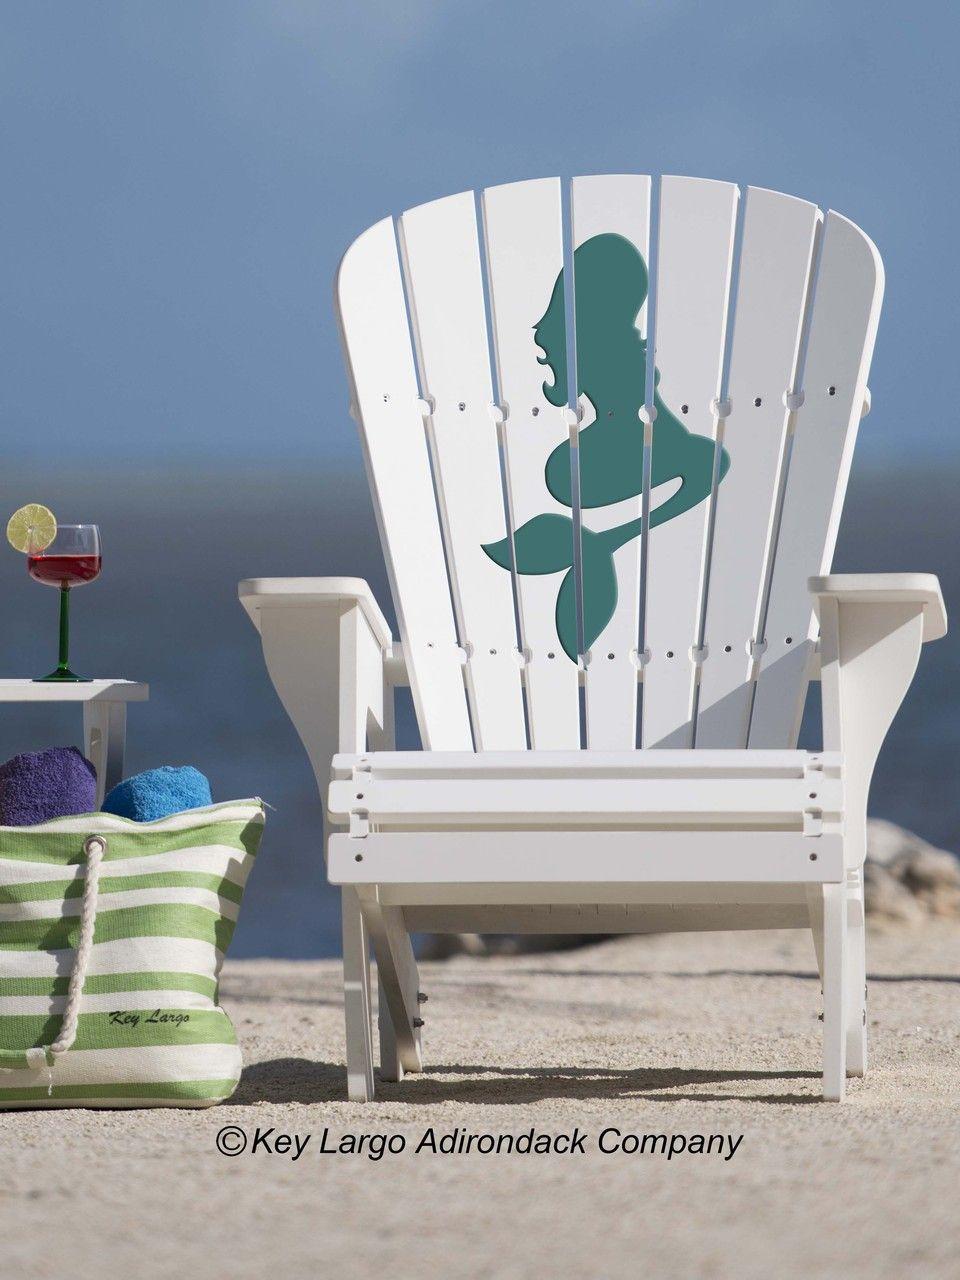 Mermaid Adirondack Chair Adirondack Chair Outdoor Chairs Summer Chairs